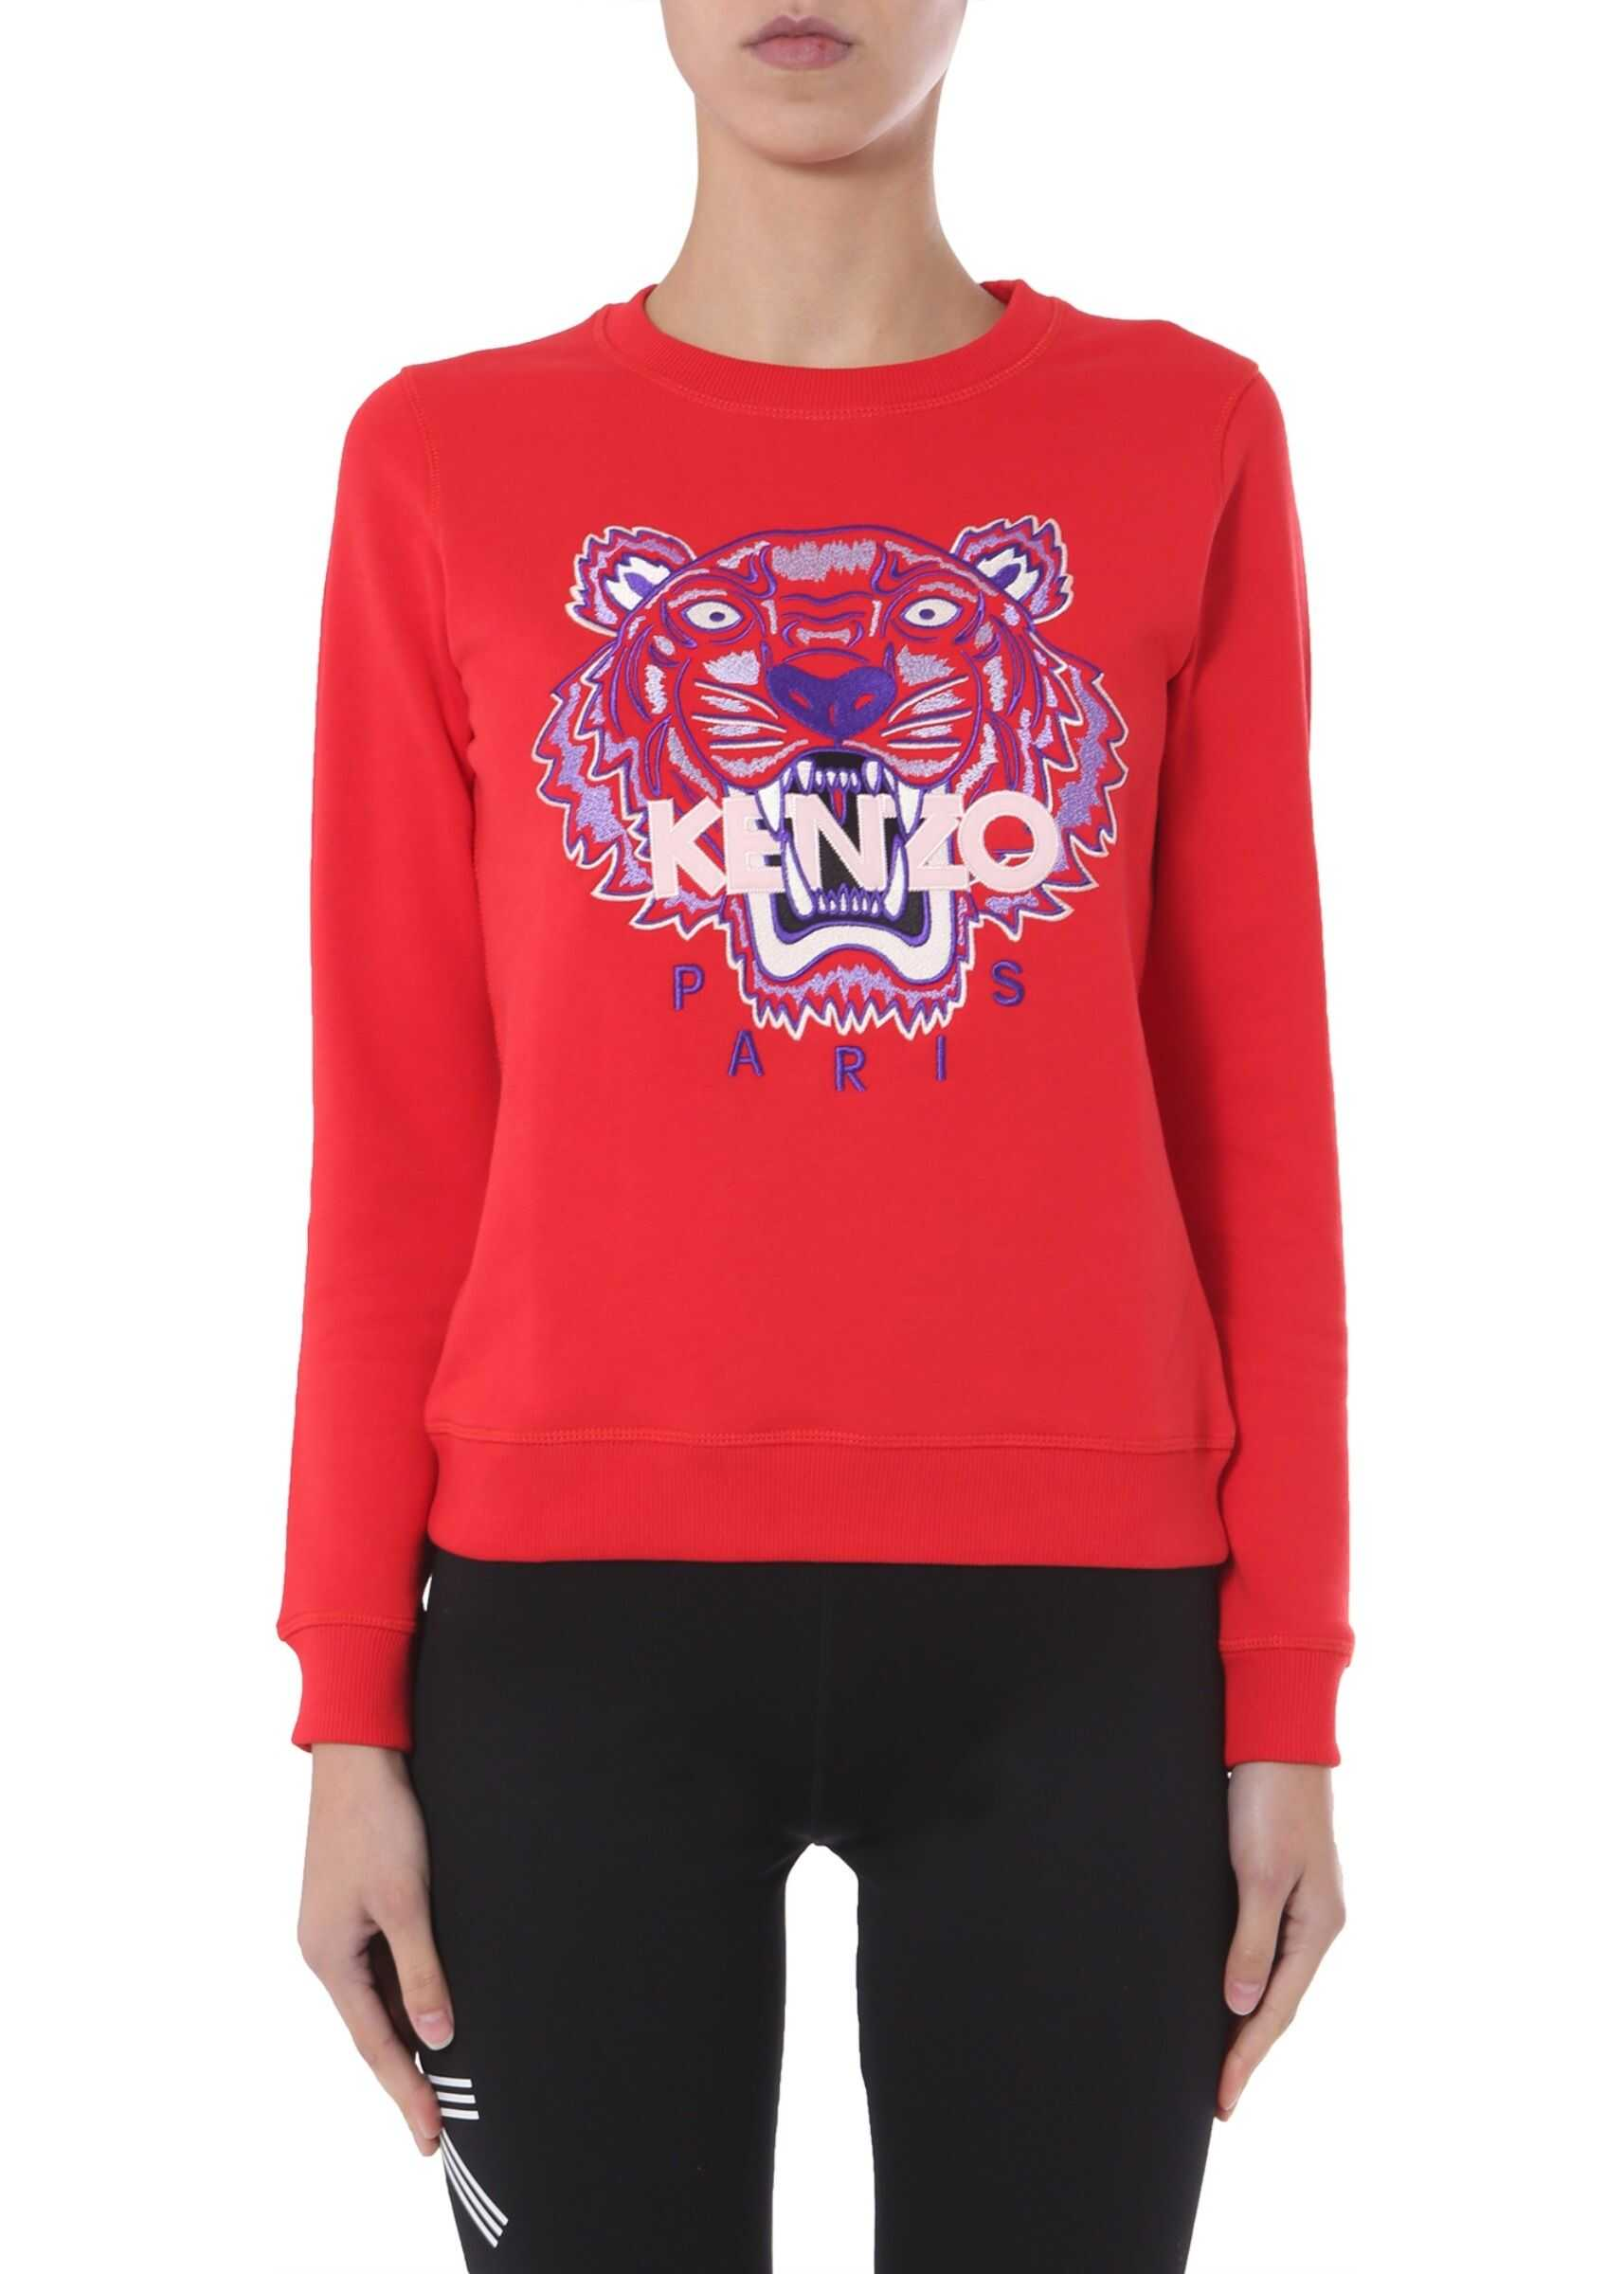 Kenzo Round Neck Sweatshirt RED